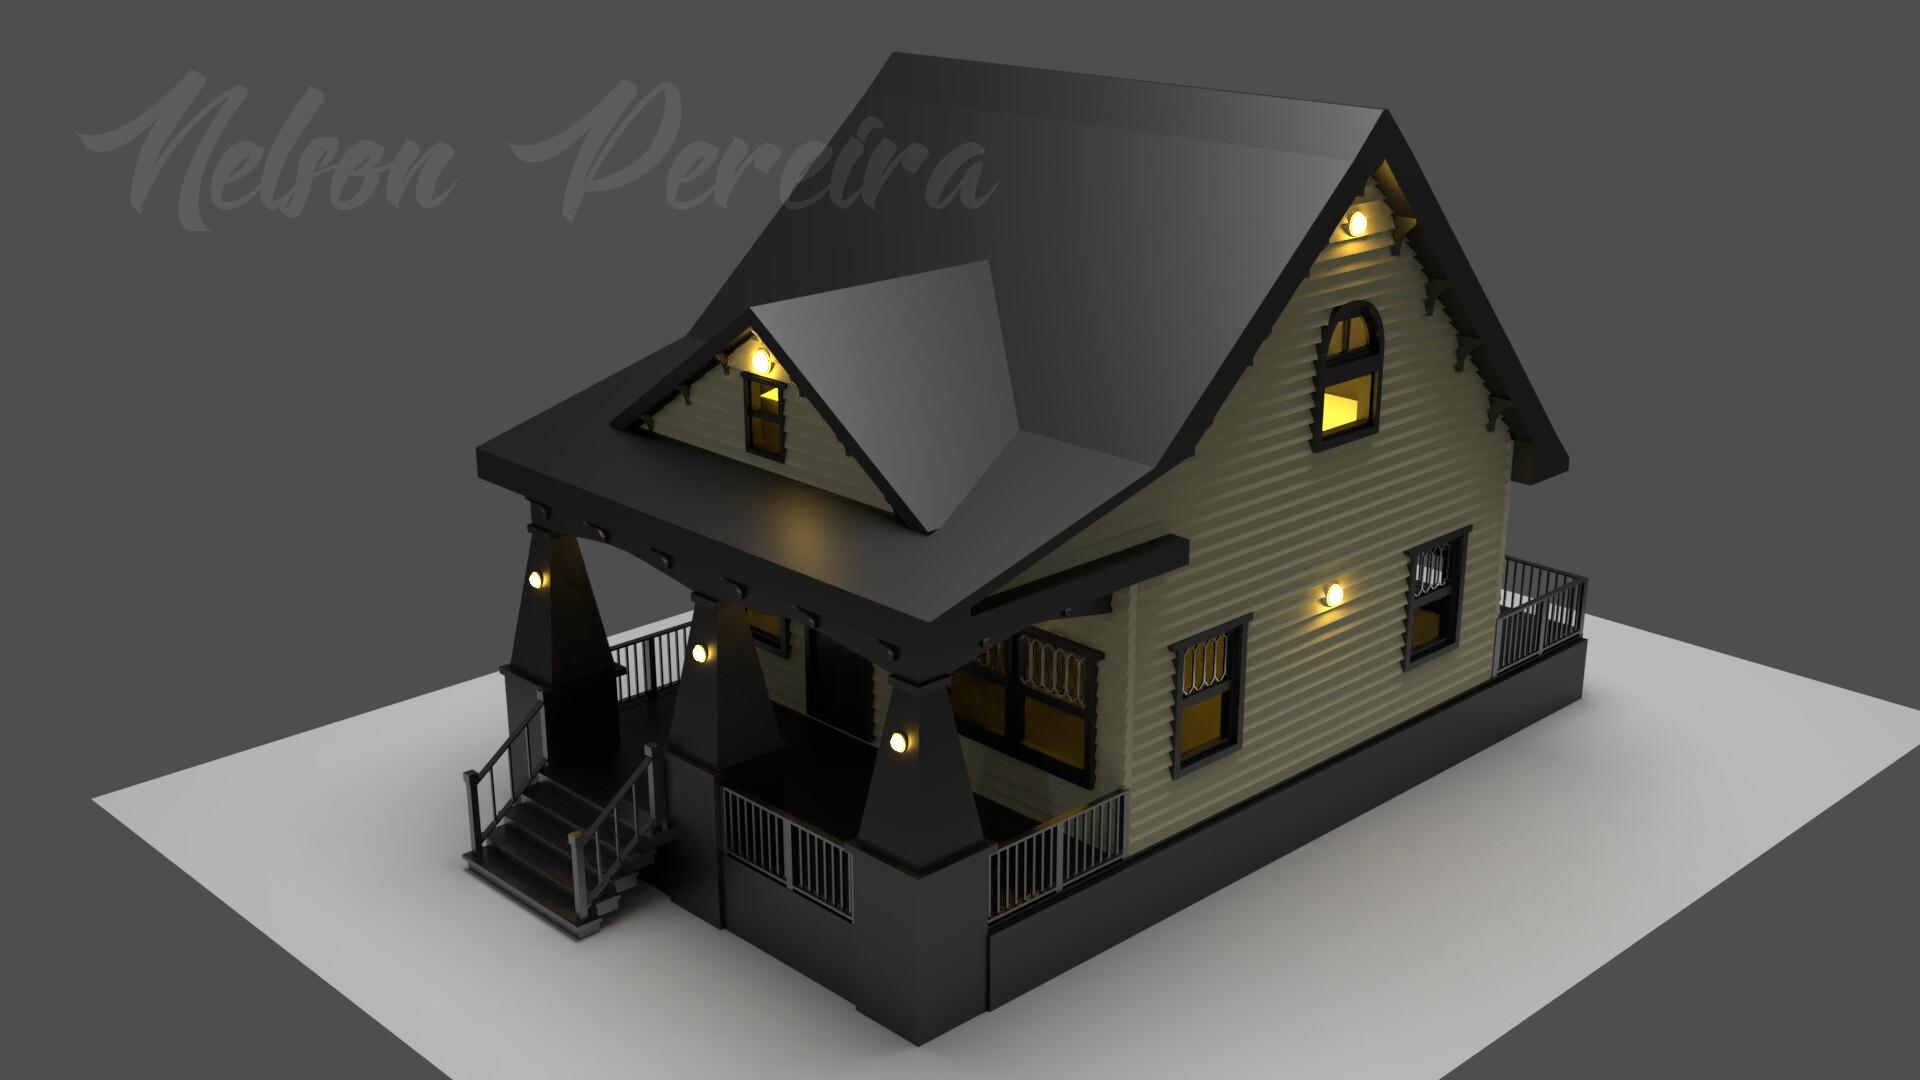 Nelson Pereira Small House I